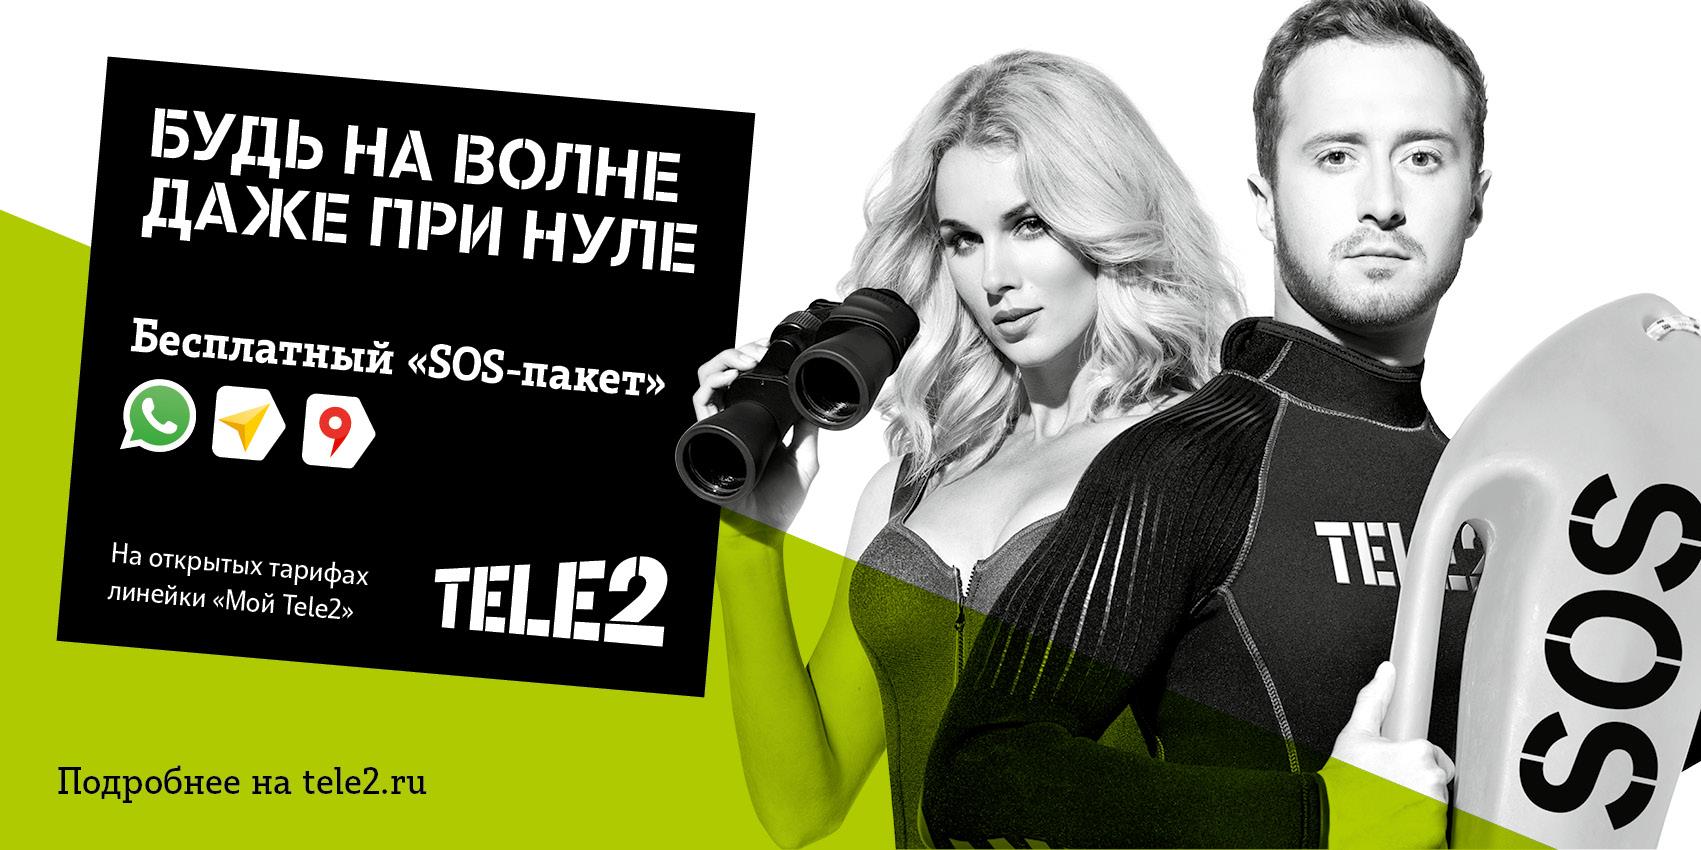 Урал – Tele2 запускает сервис «SOS-пакет», который гарантирует клиентам доступ к самым важным усл